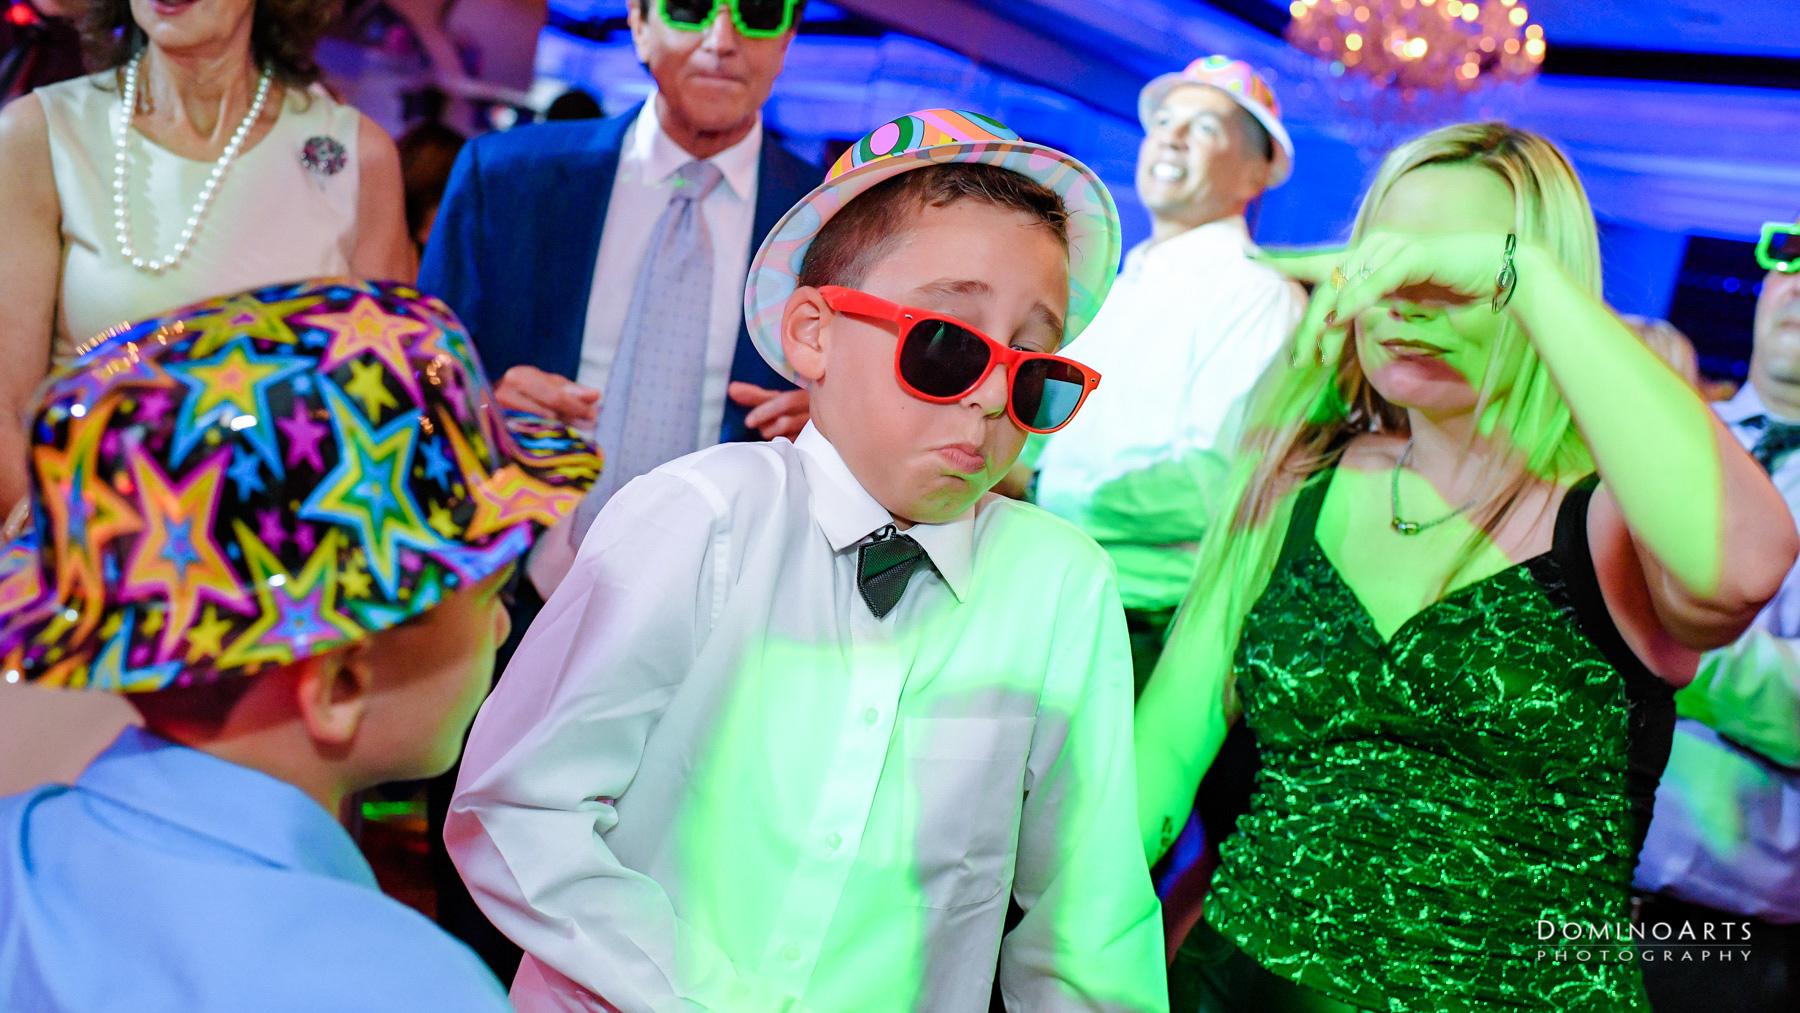 Fun party pictures at Temple Beth El Mitzvah, Boca Raton Mitzvah